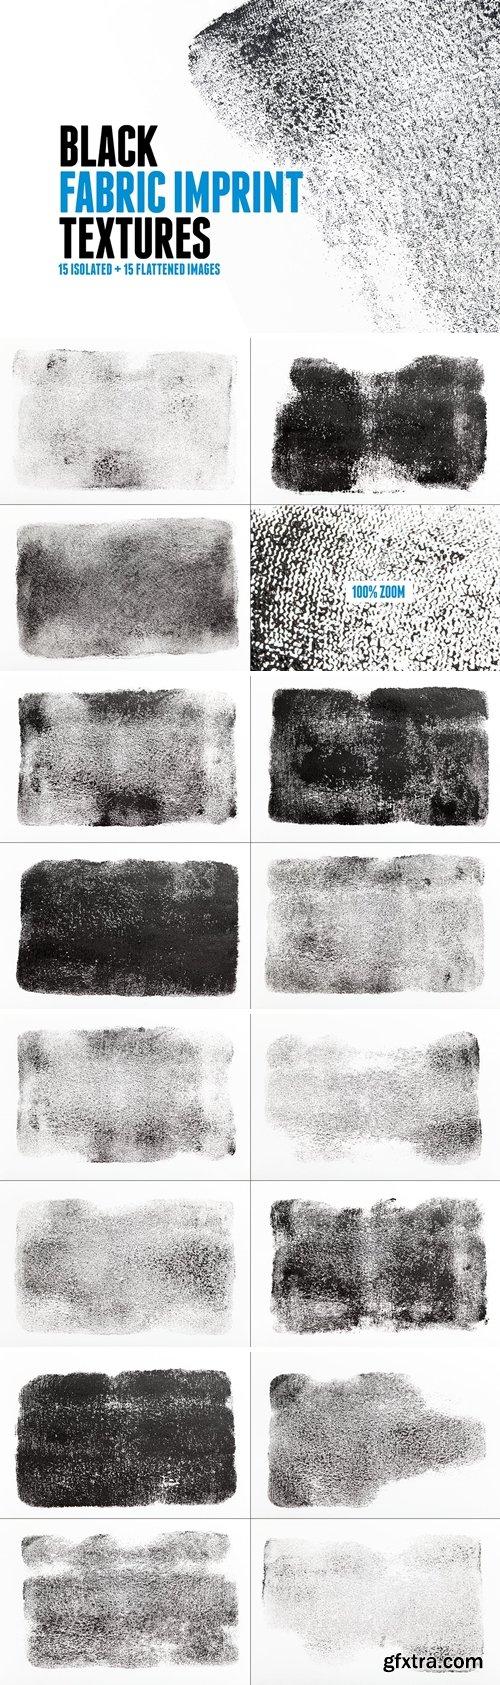 15 Black Fabric Imprint Textures